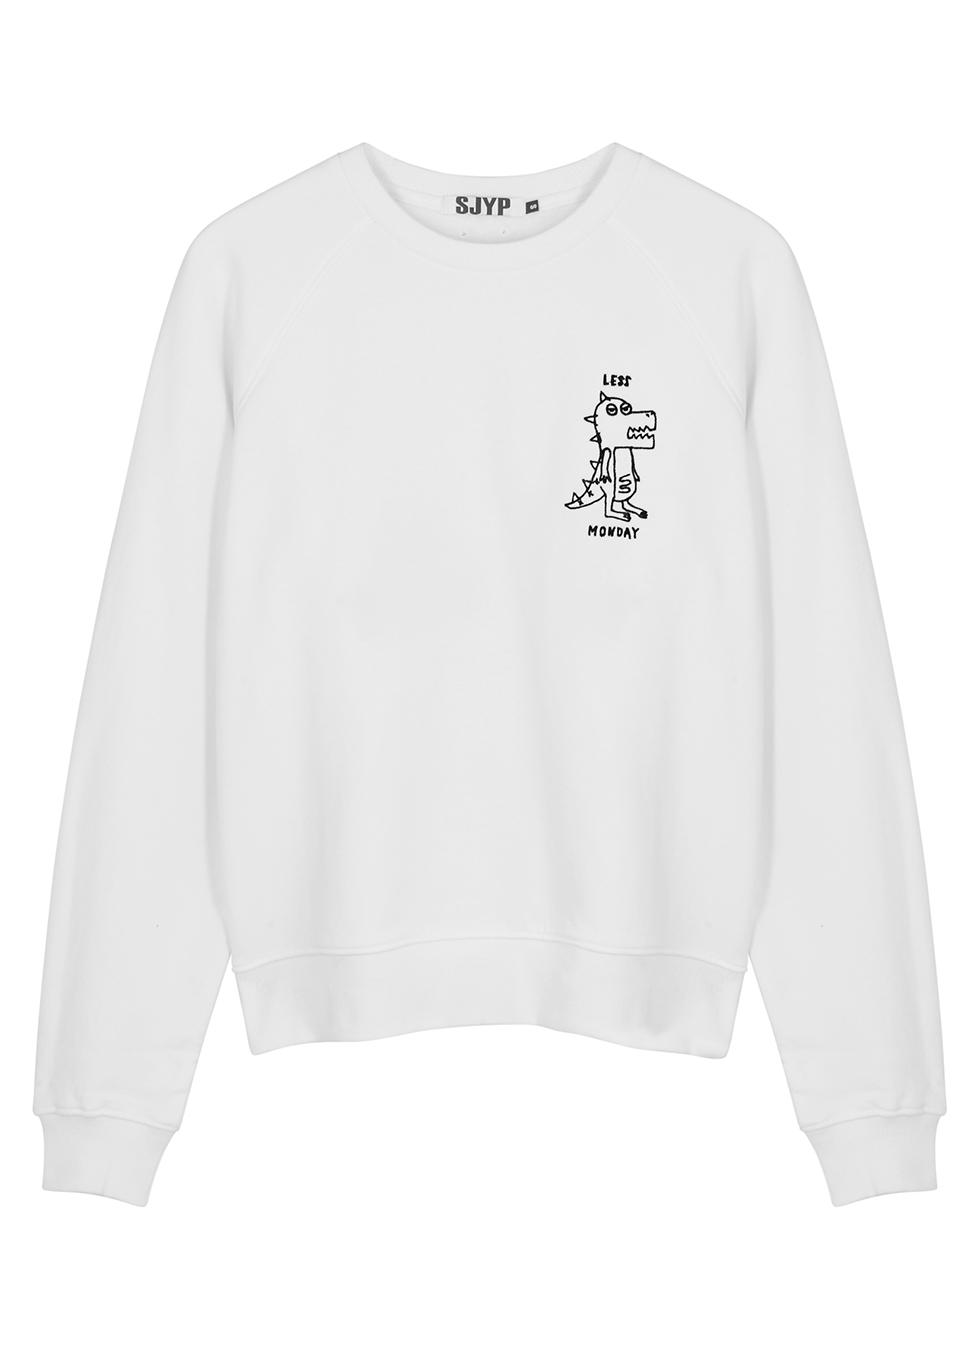 Off-white embroidered cotton sweatshirt - SJYP